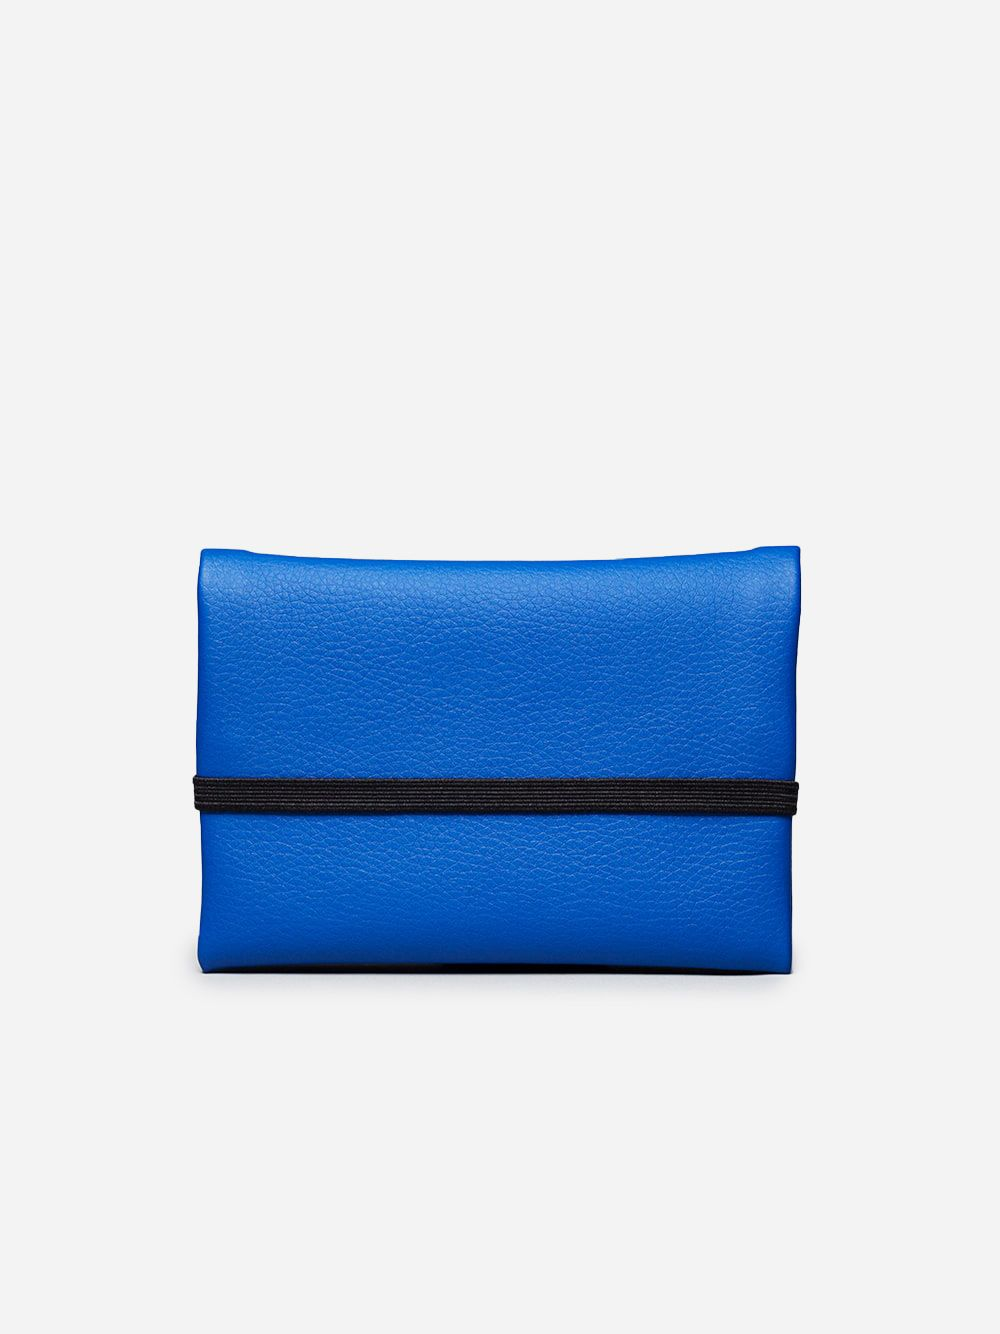 Bolsa Multifunções Azul | Wetheknot